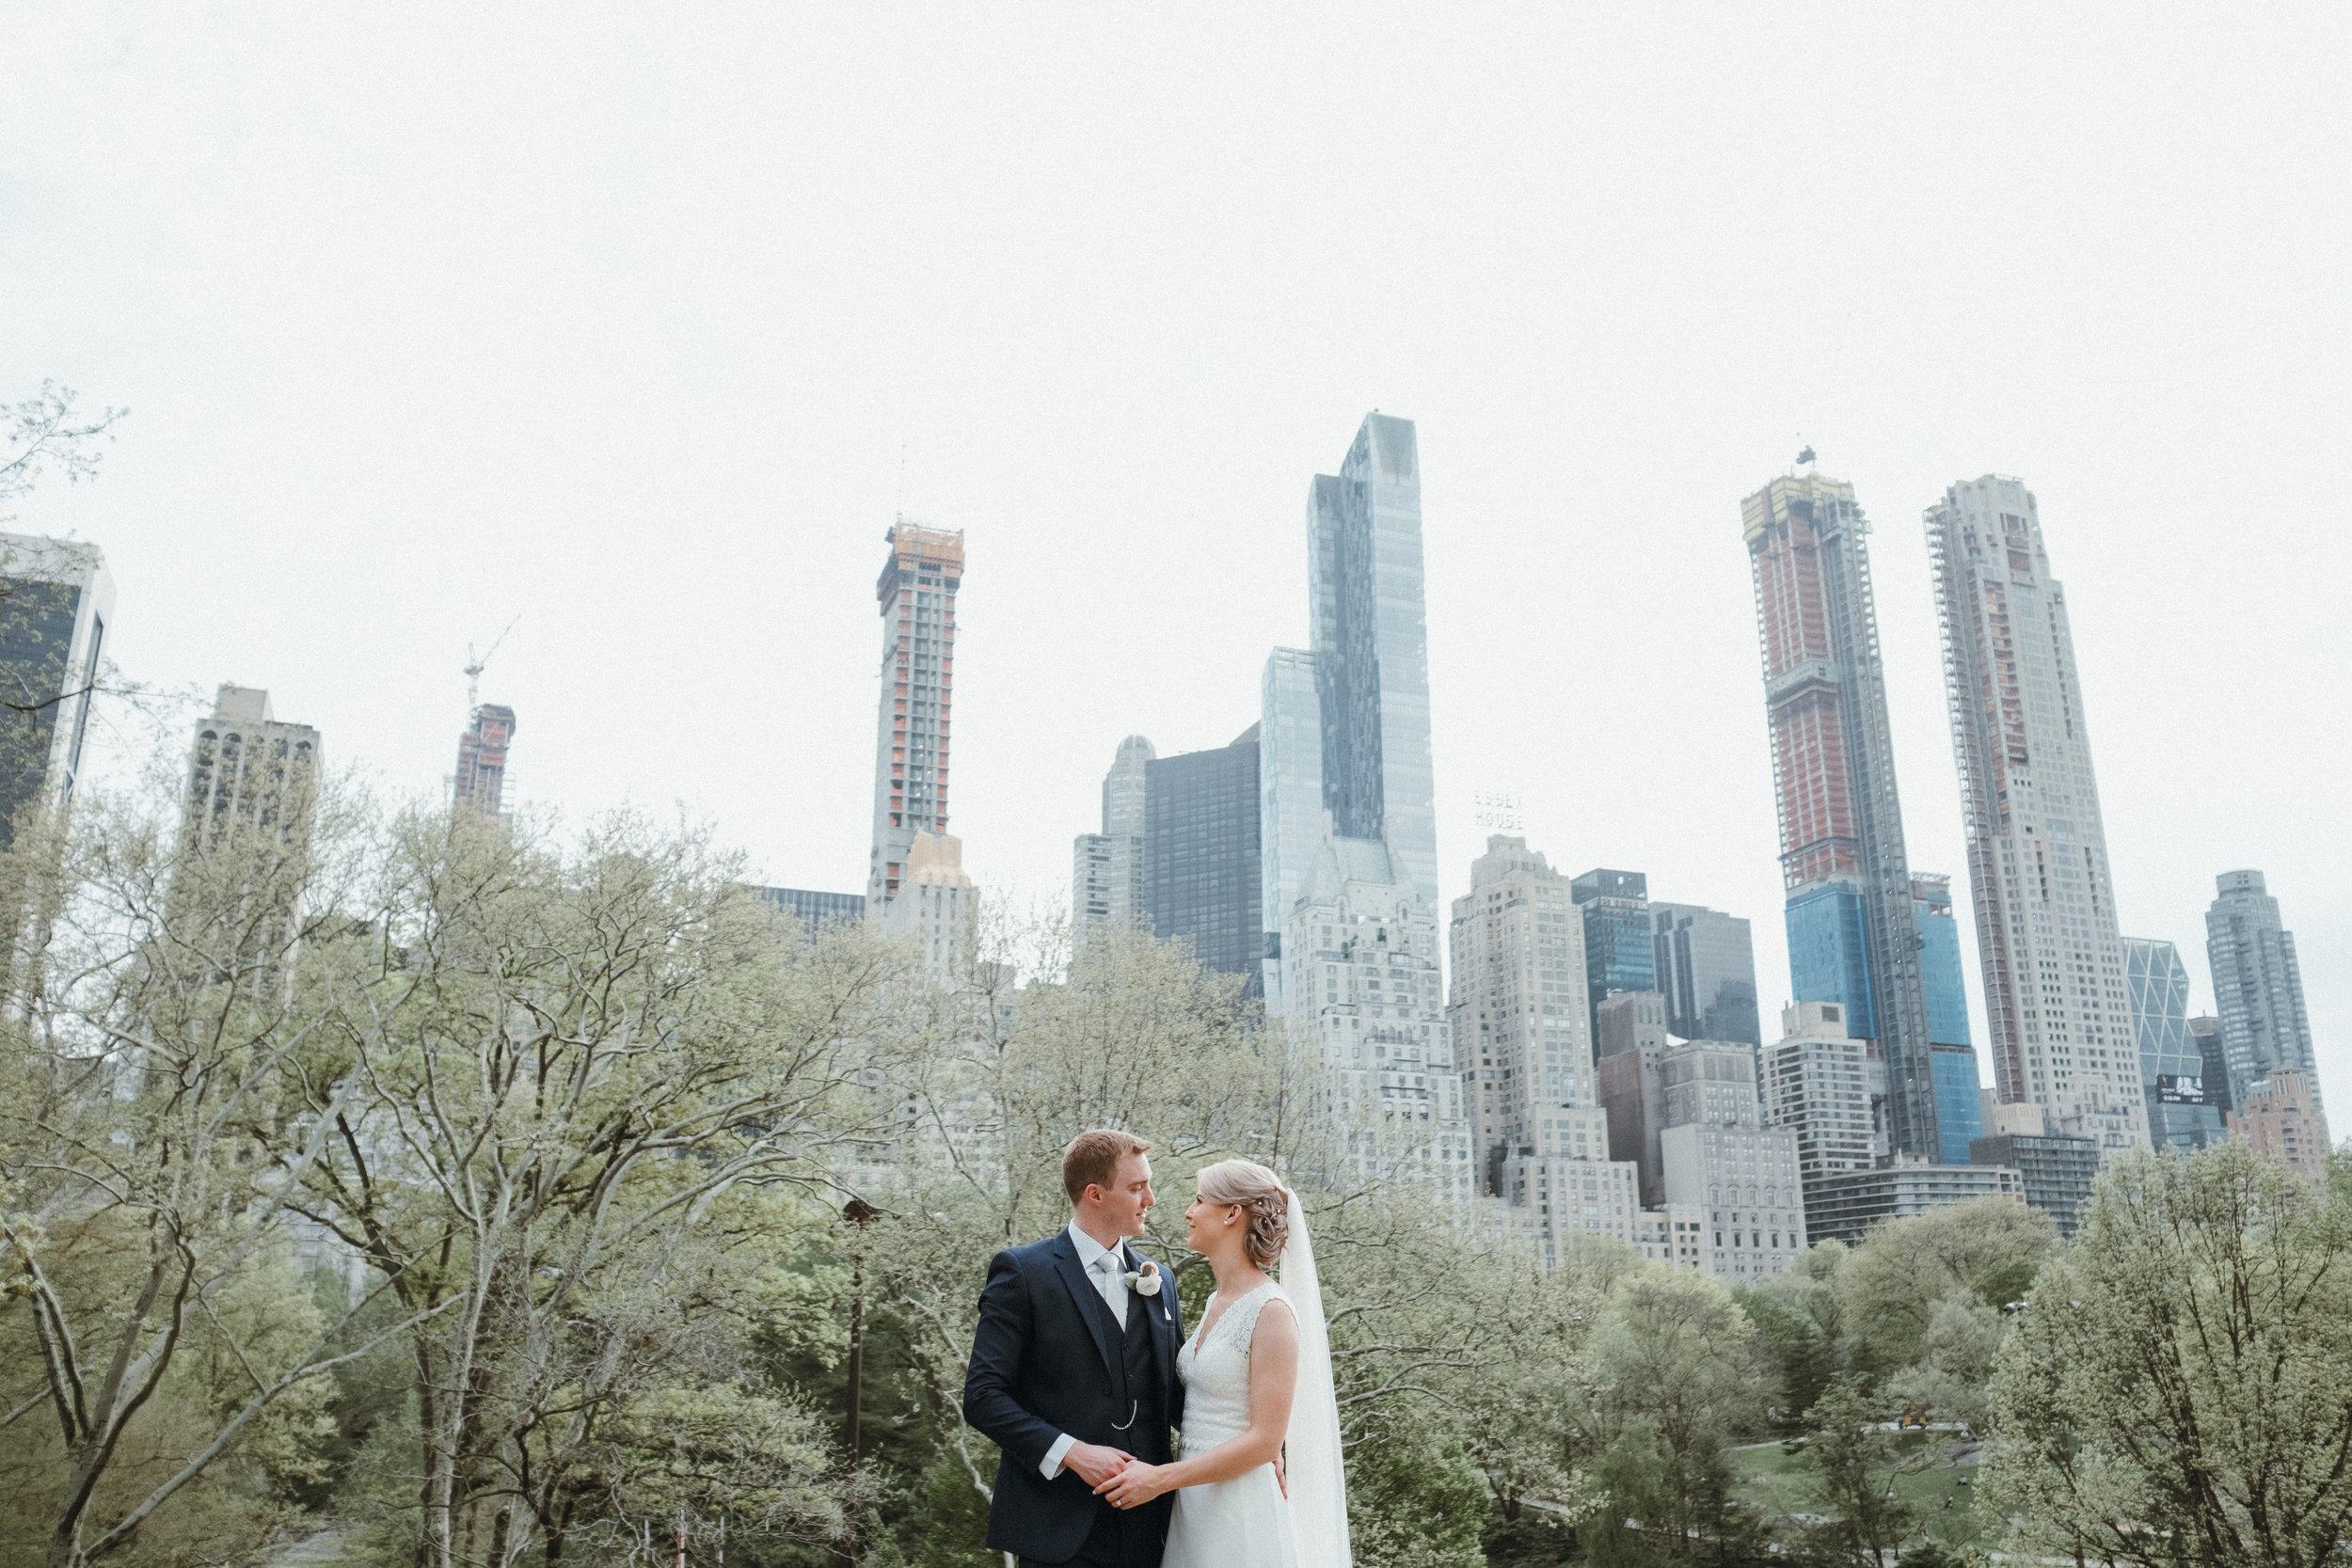 Central Park wedding with New York skyline